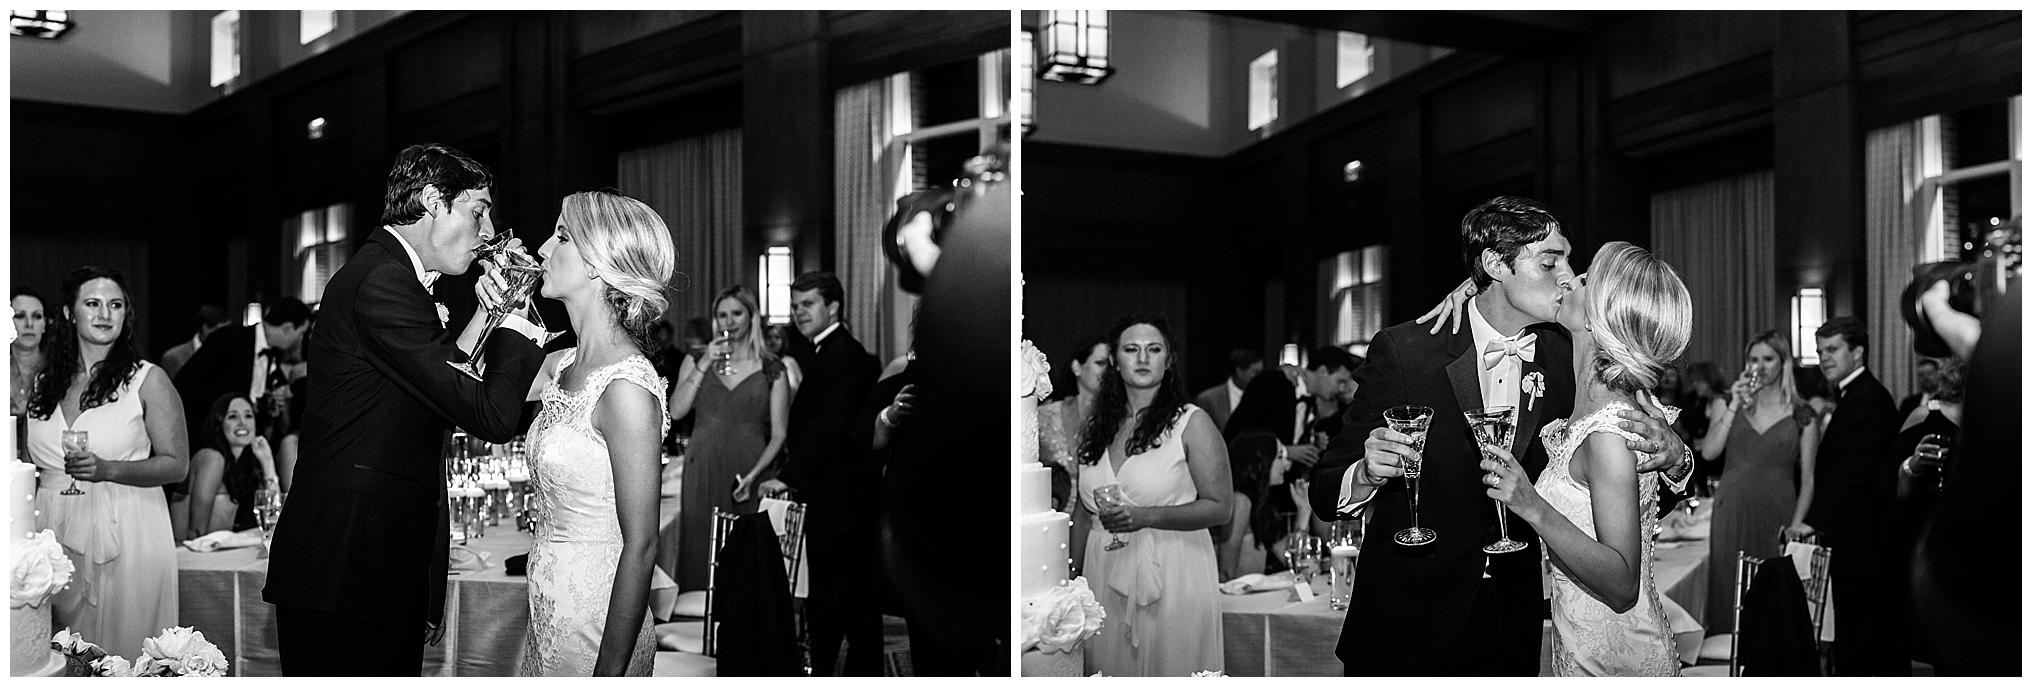 Chapel-Hill-Wedding-Photographer-38.jpg